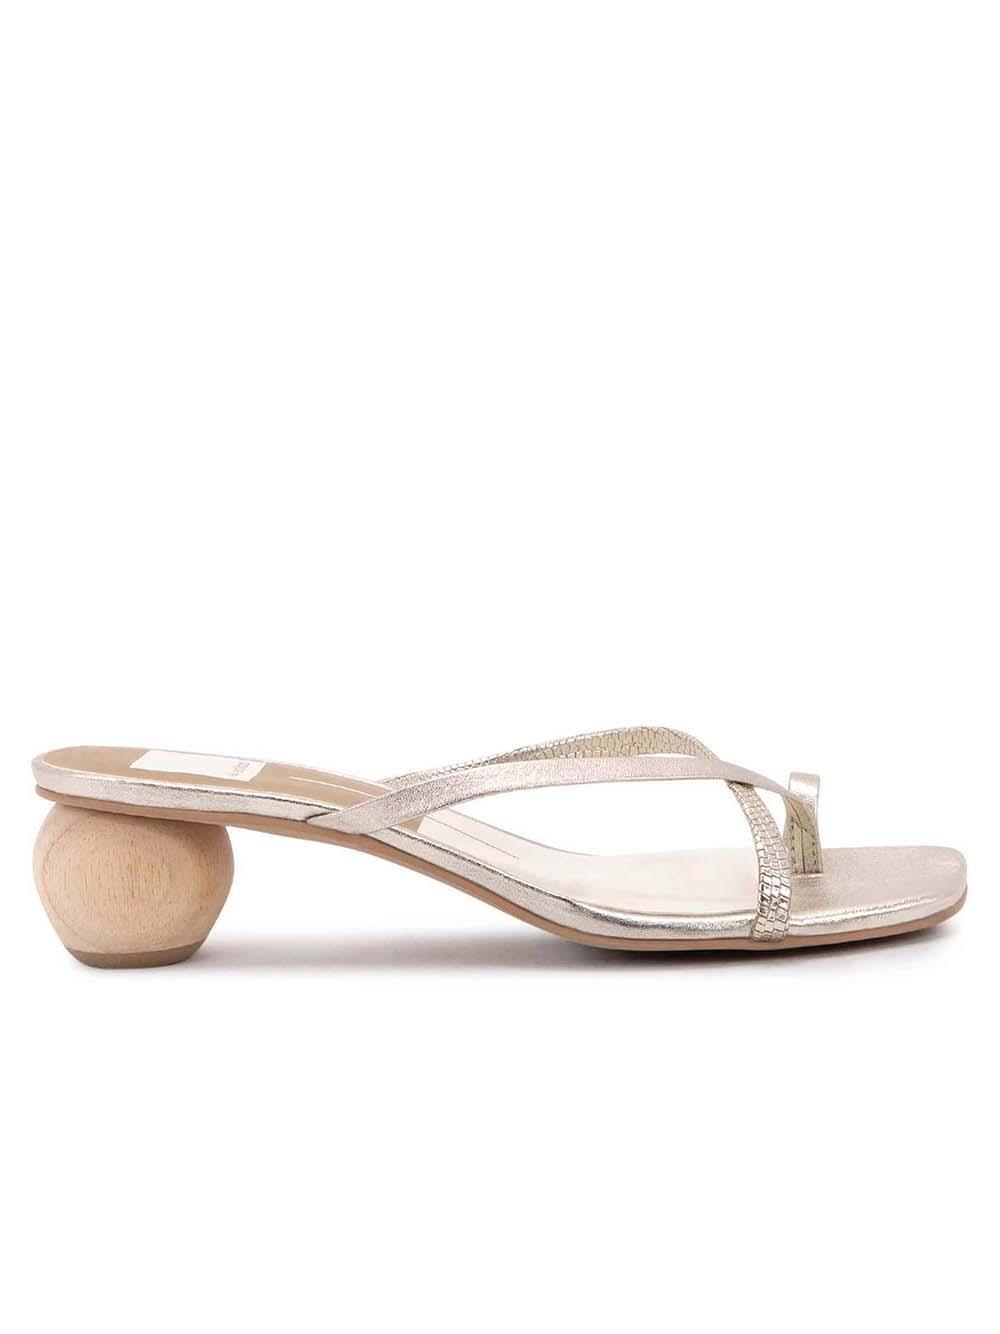 Betsey Sandal